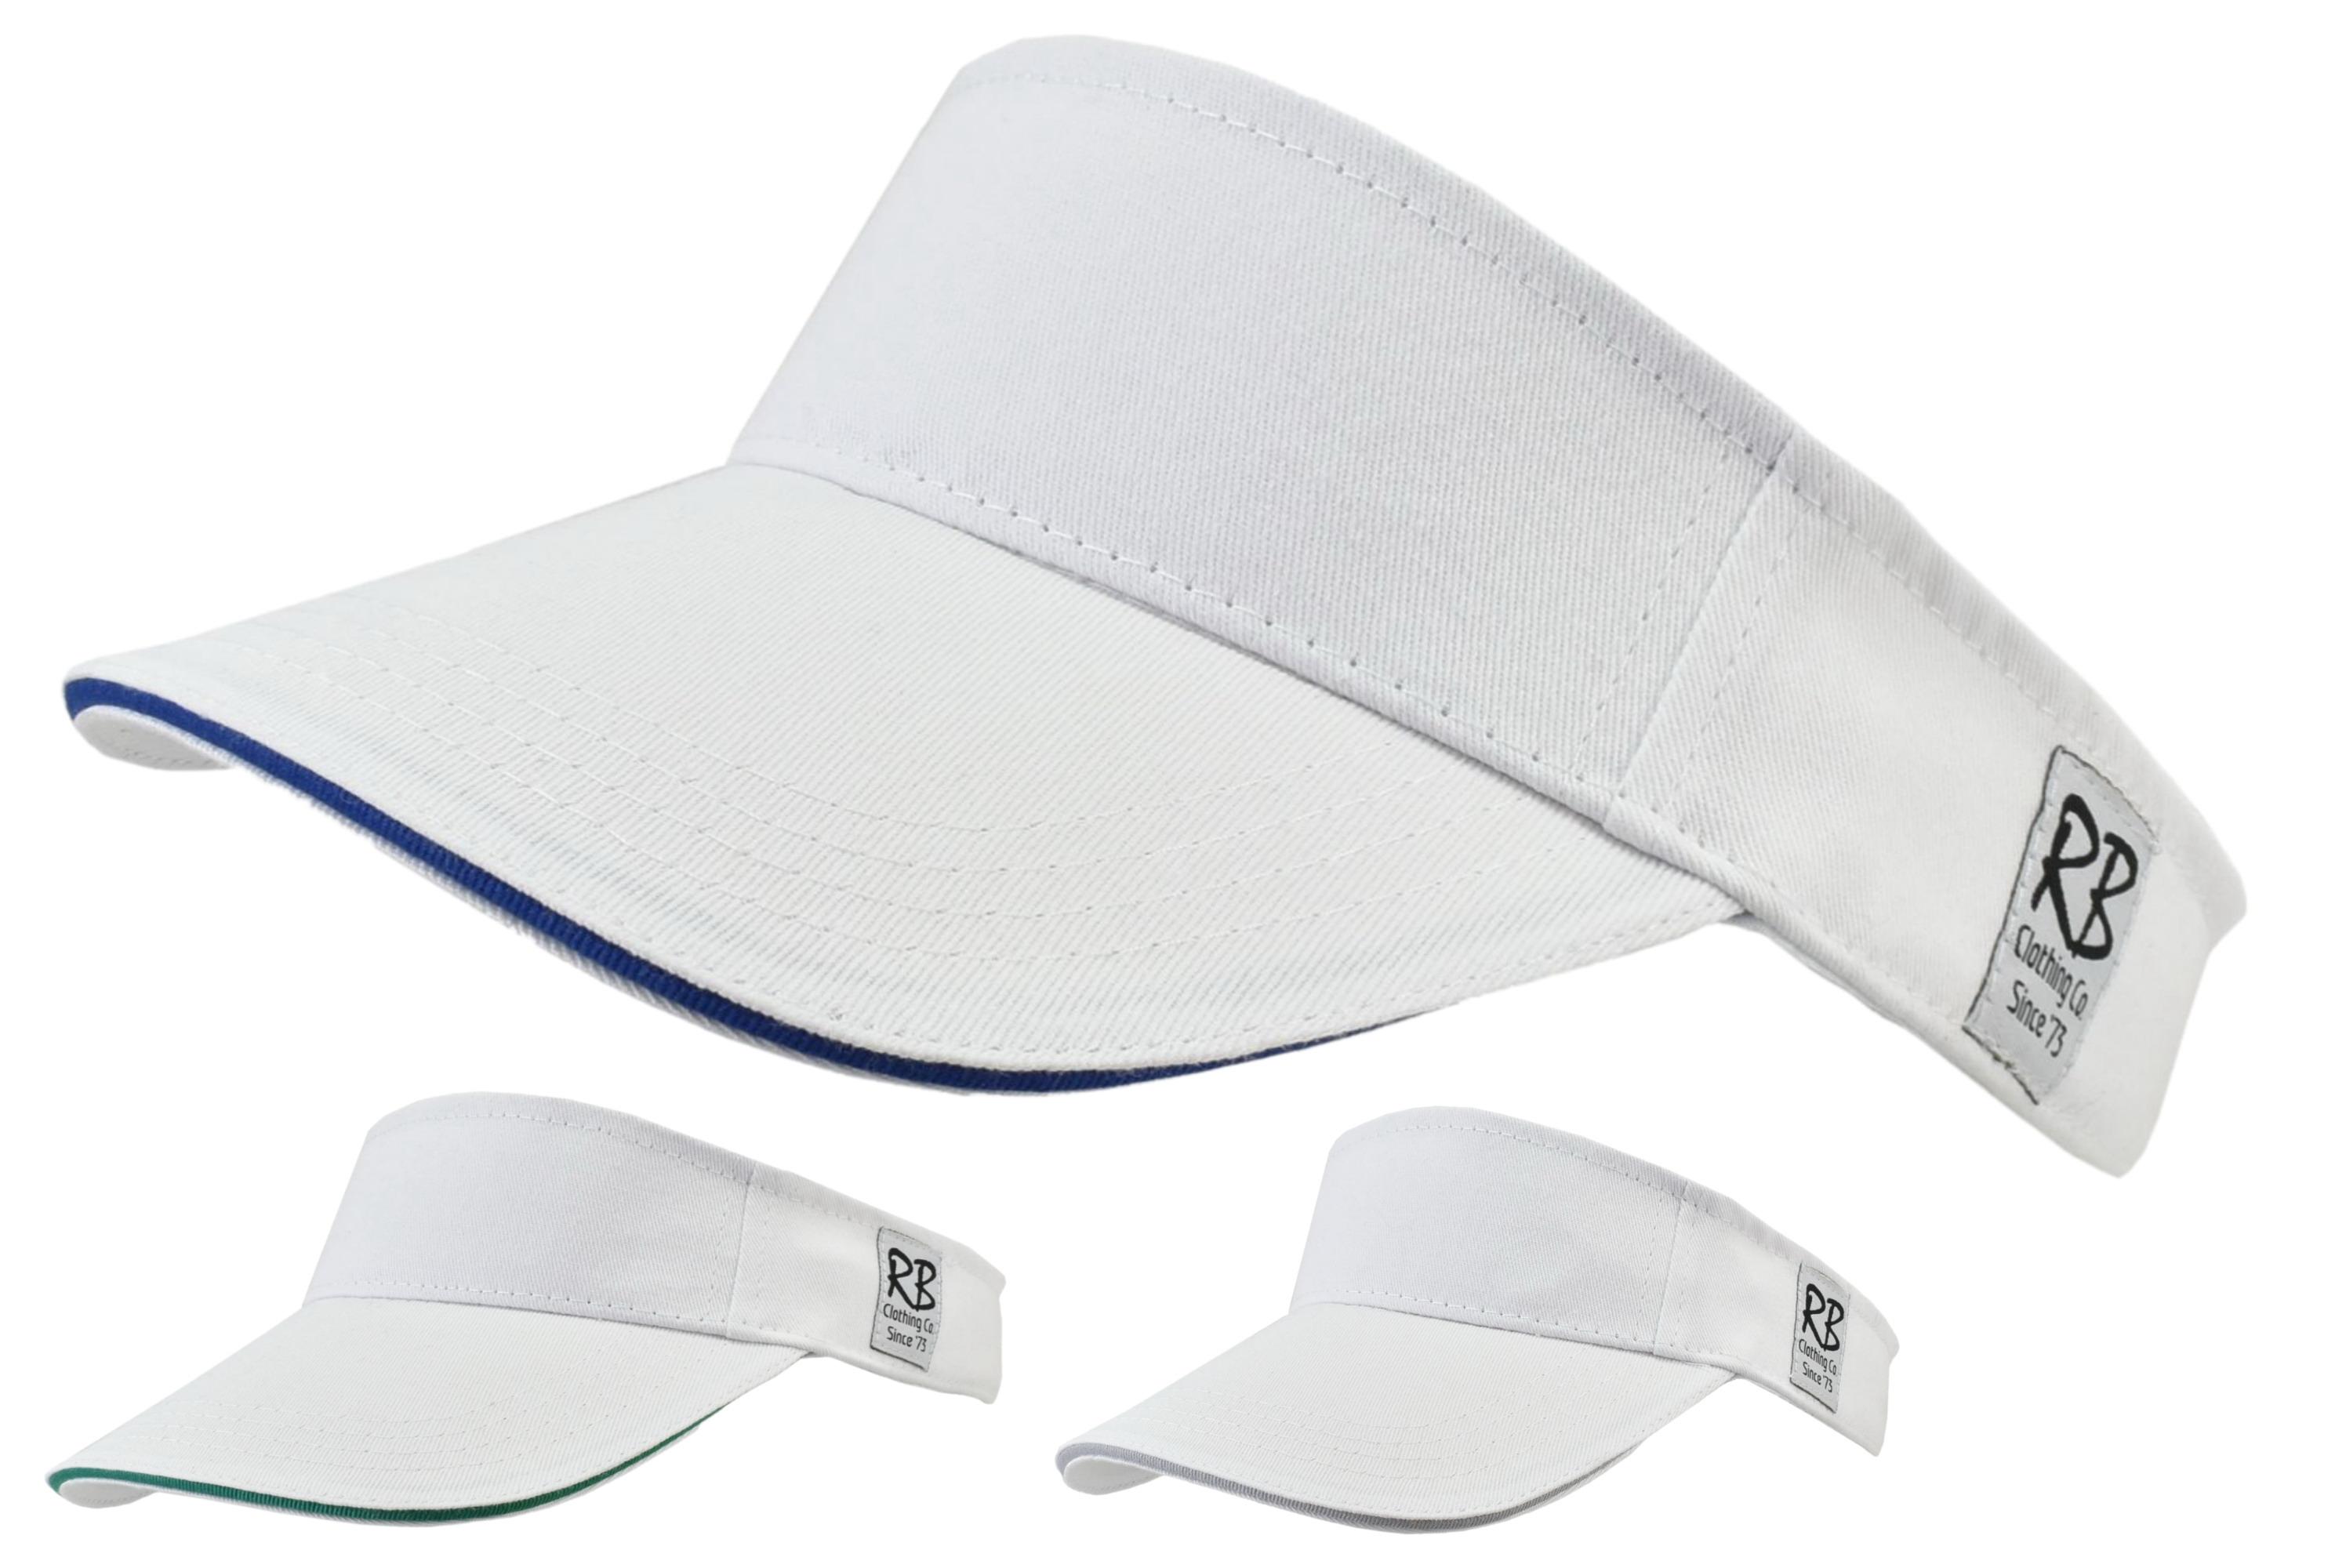 White Cotton Visor With Comfort Band